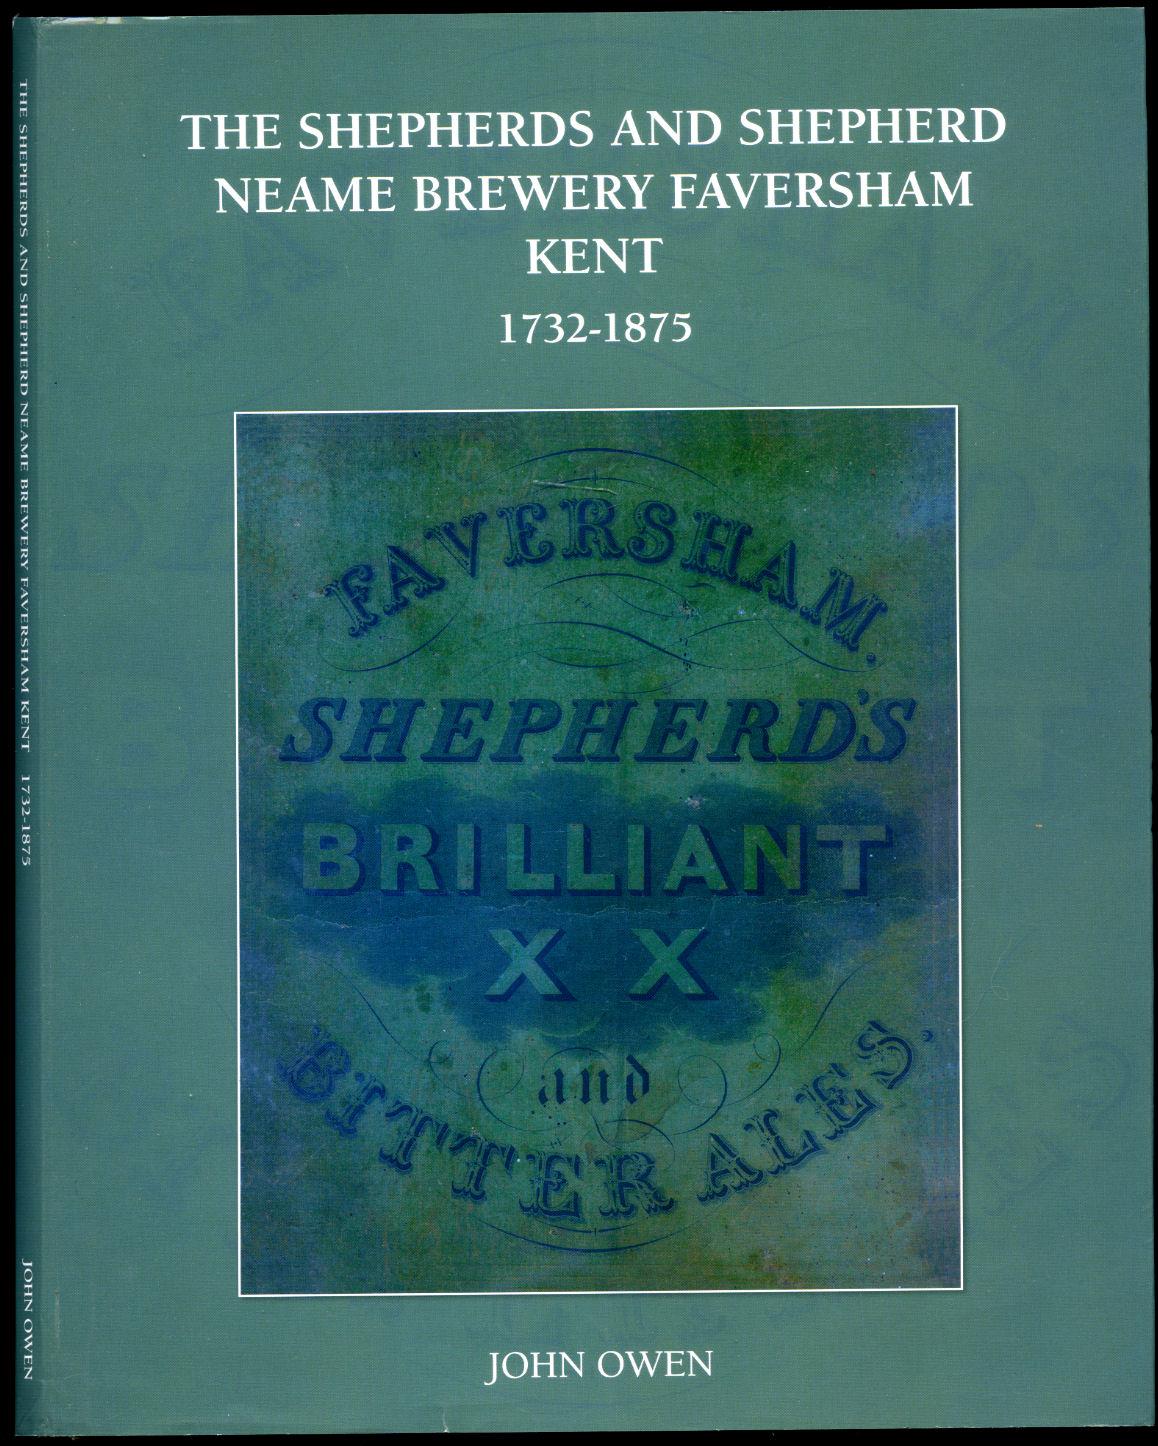 OWEN, JOHN - The Shepherds and Shepherd Neame Neame Brewery Faversham Kent 1732-1875